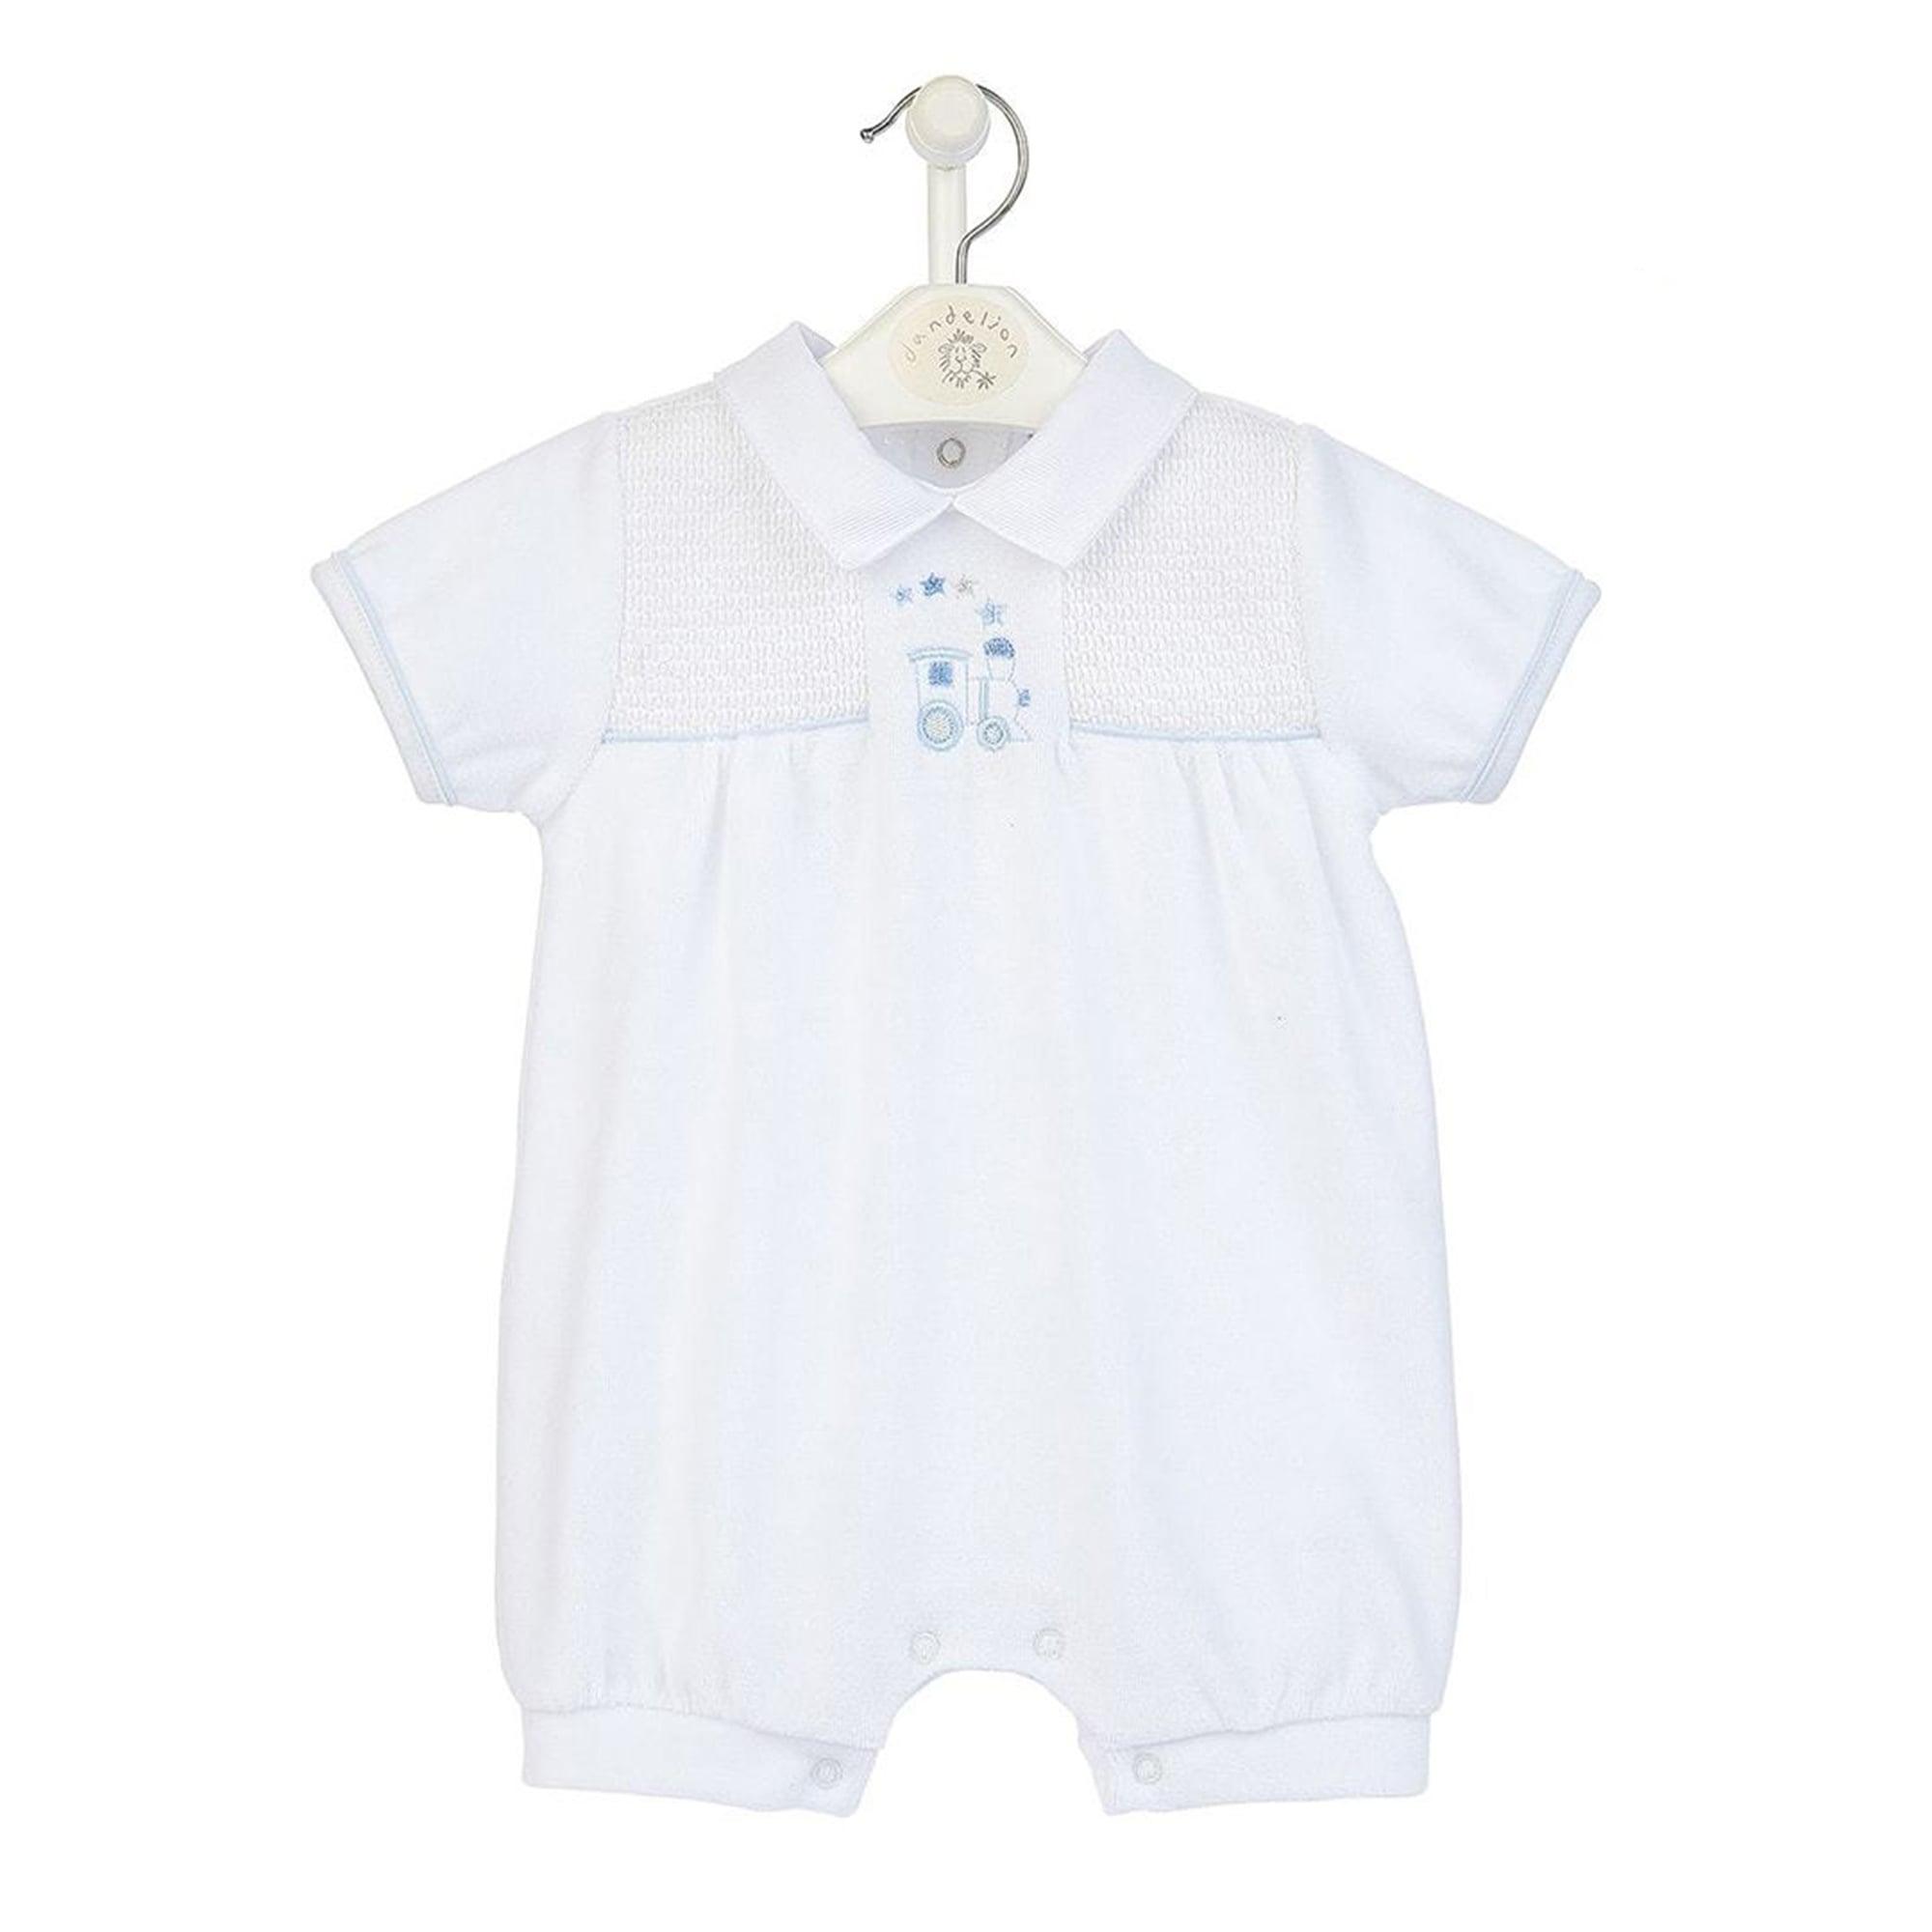 Mary Shortle Train Velour Smocked Romper White Clothing